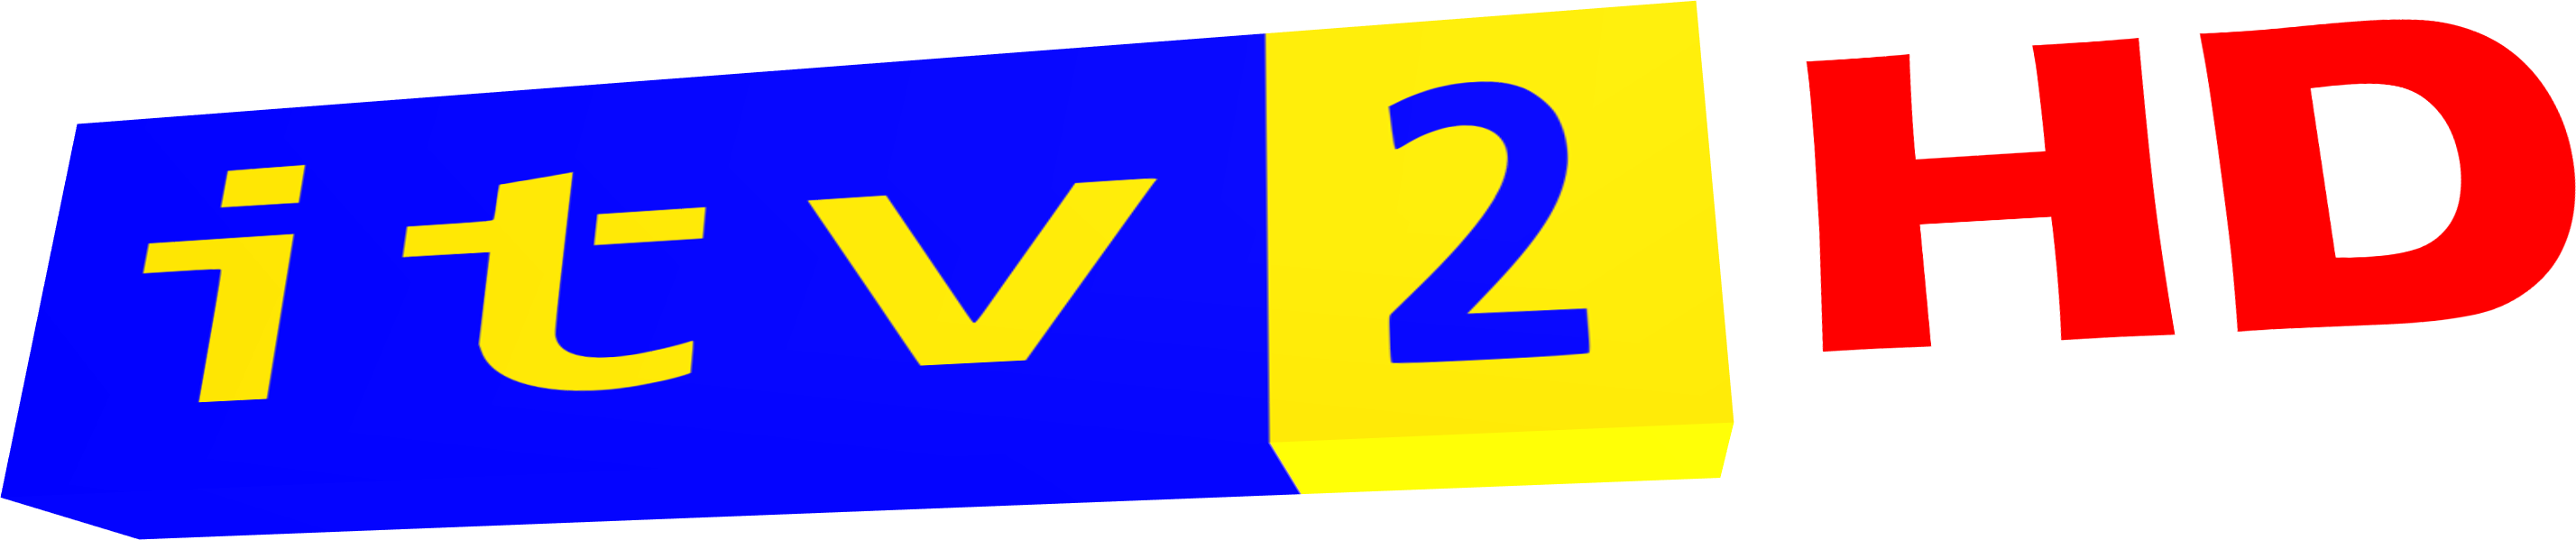 Itv2 Hd Logo PNG - 112444